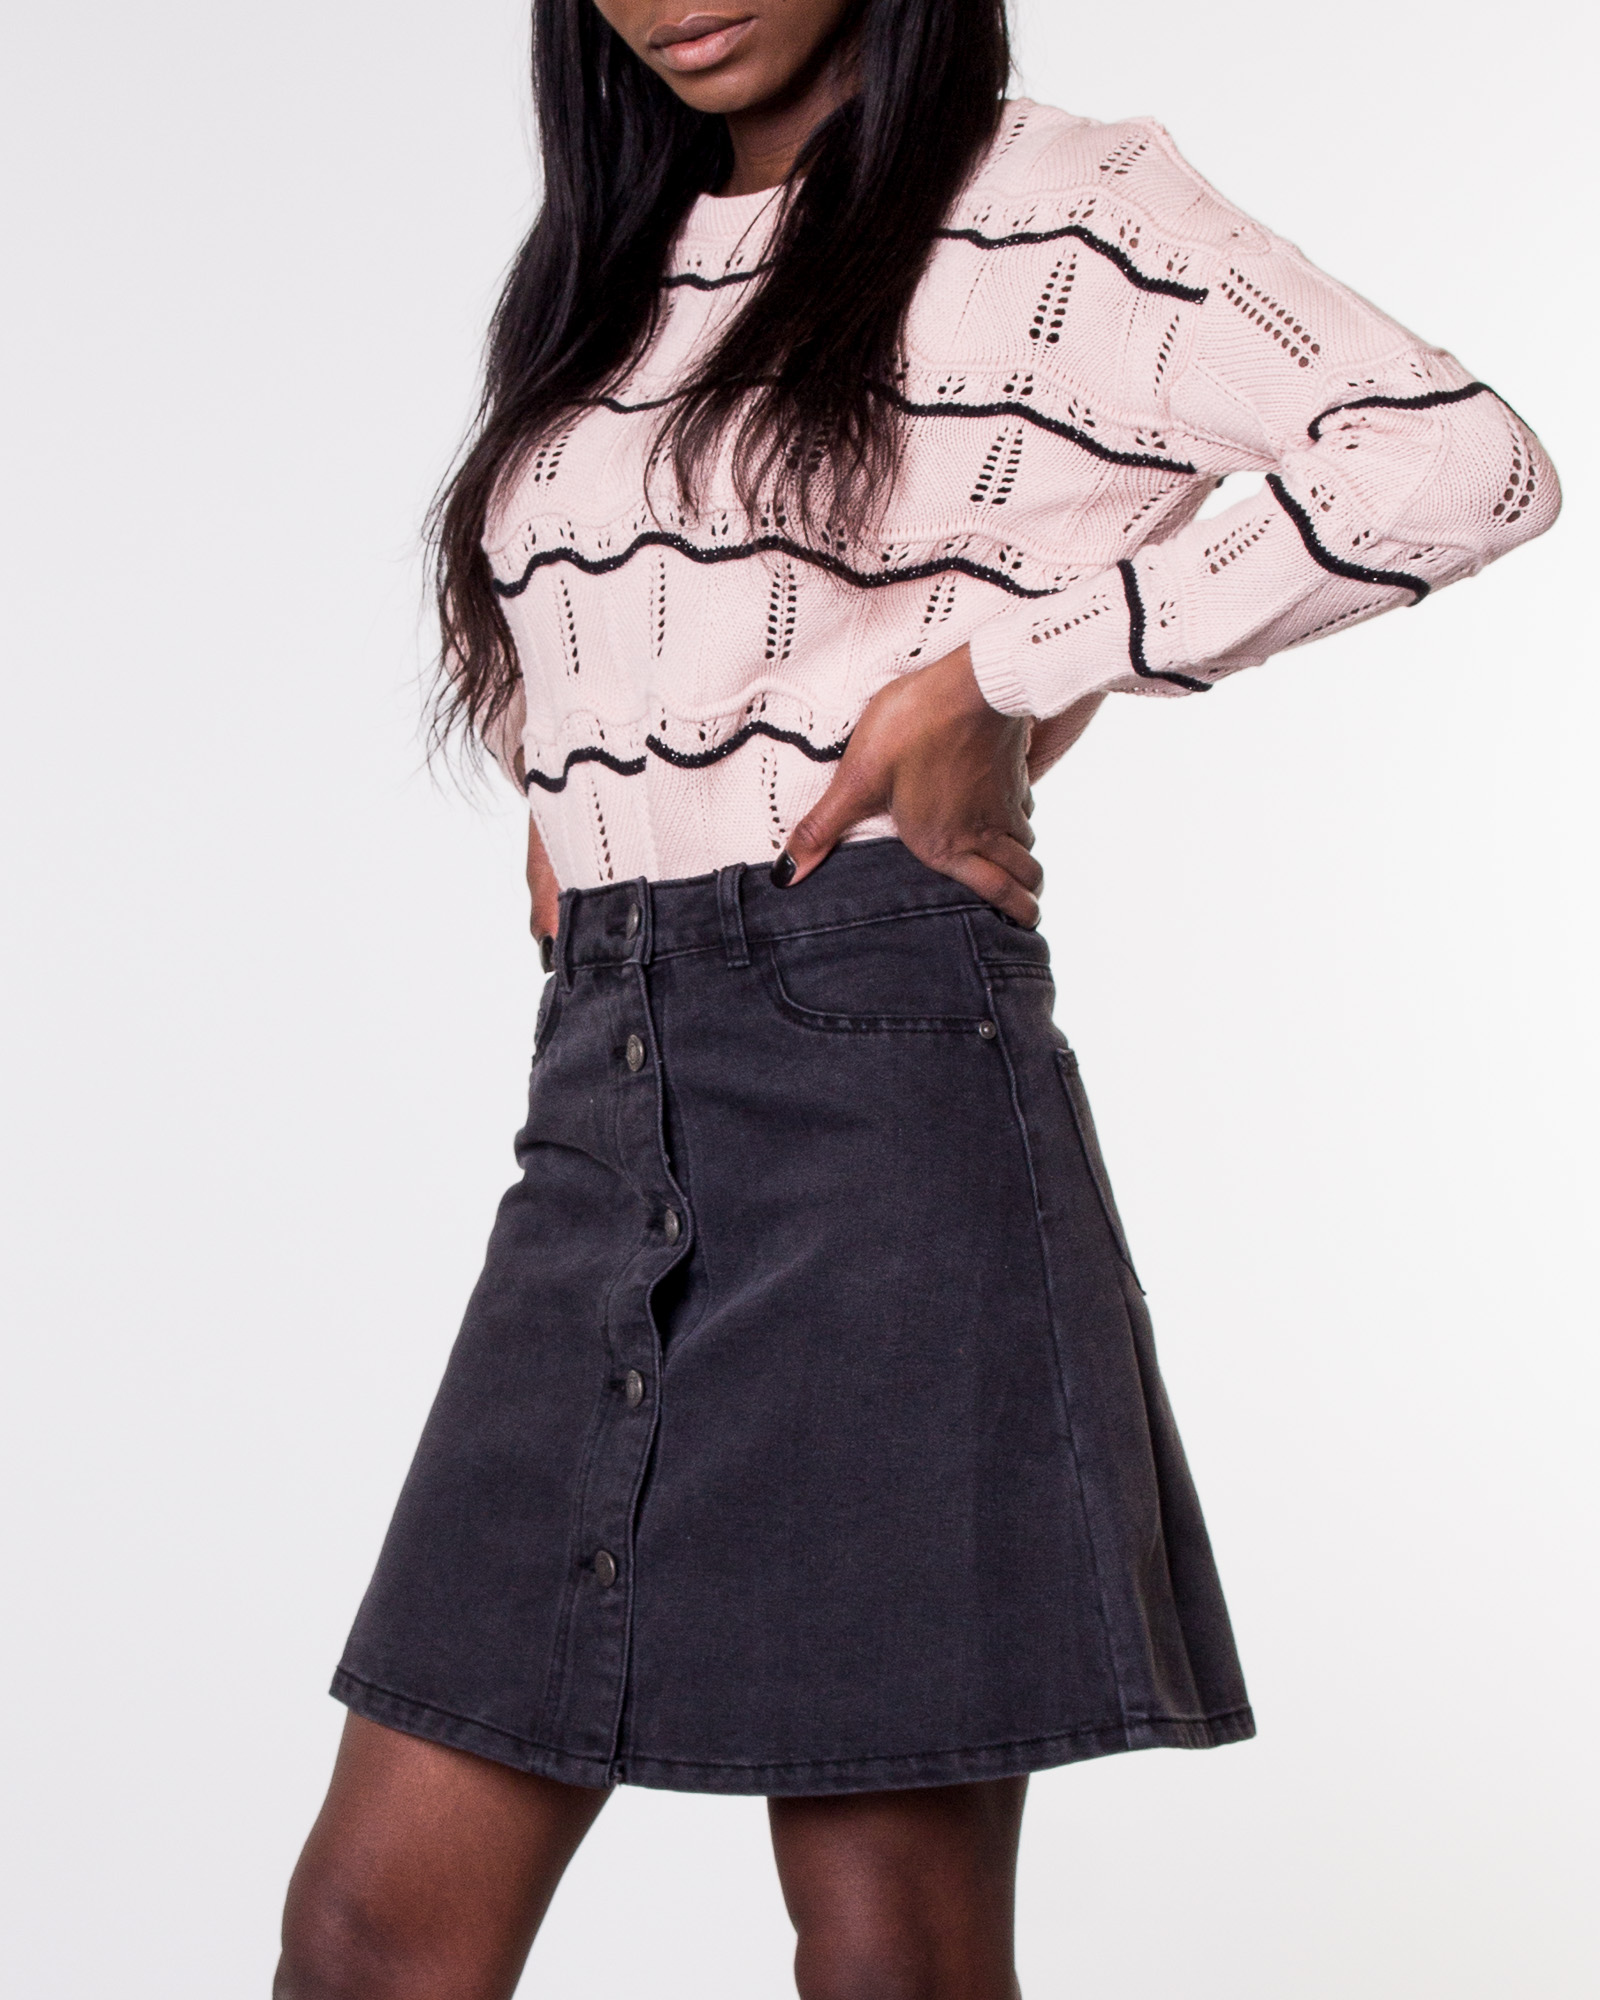 a24af6a7d64a47 Noisy may, Sunny Short Skater Skirt Black Denim | Skirts ...